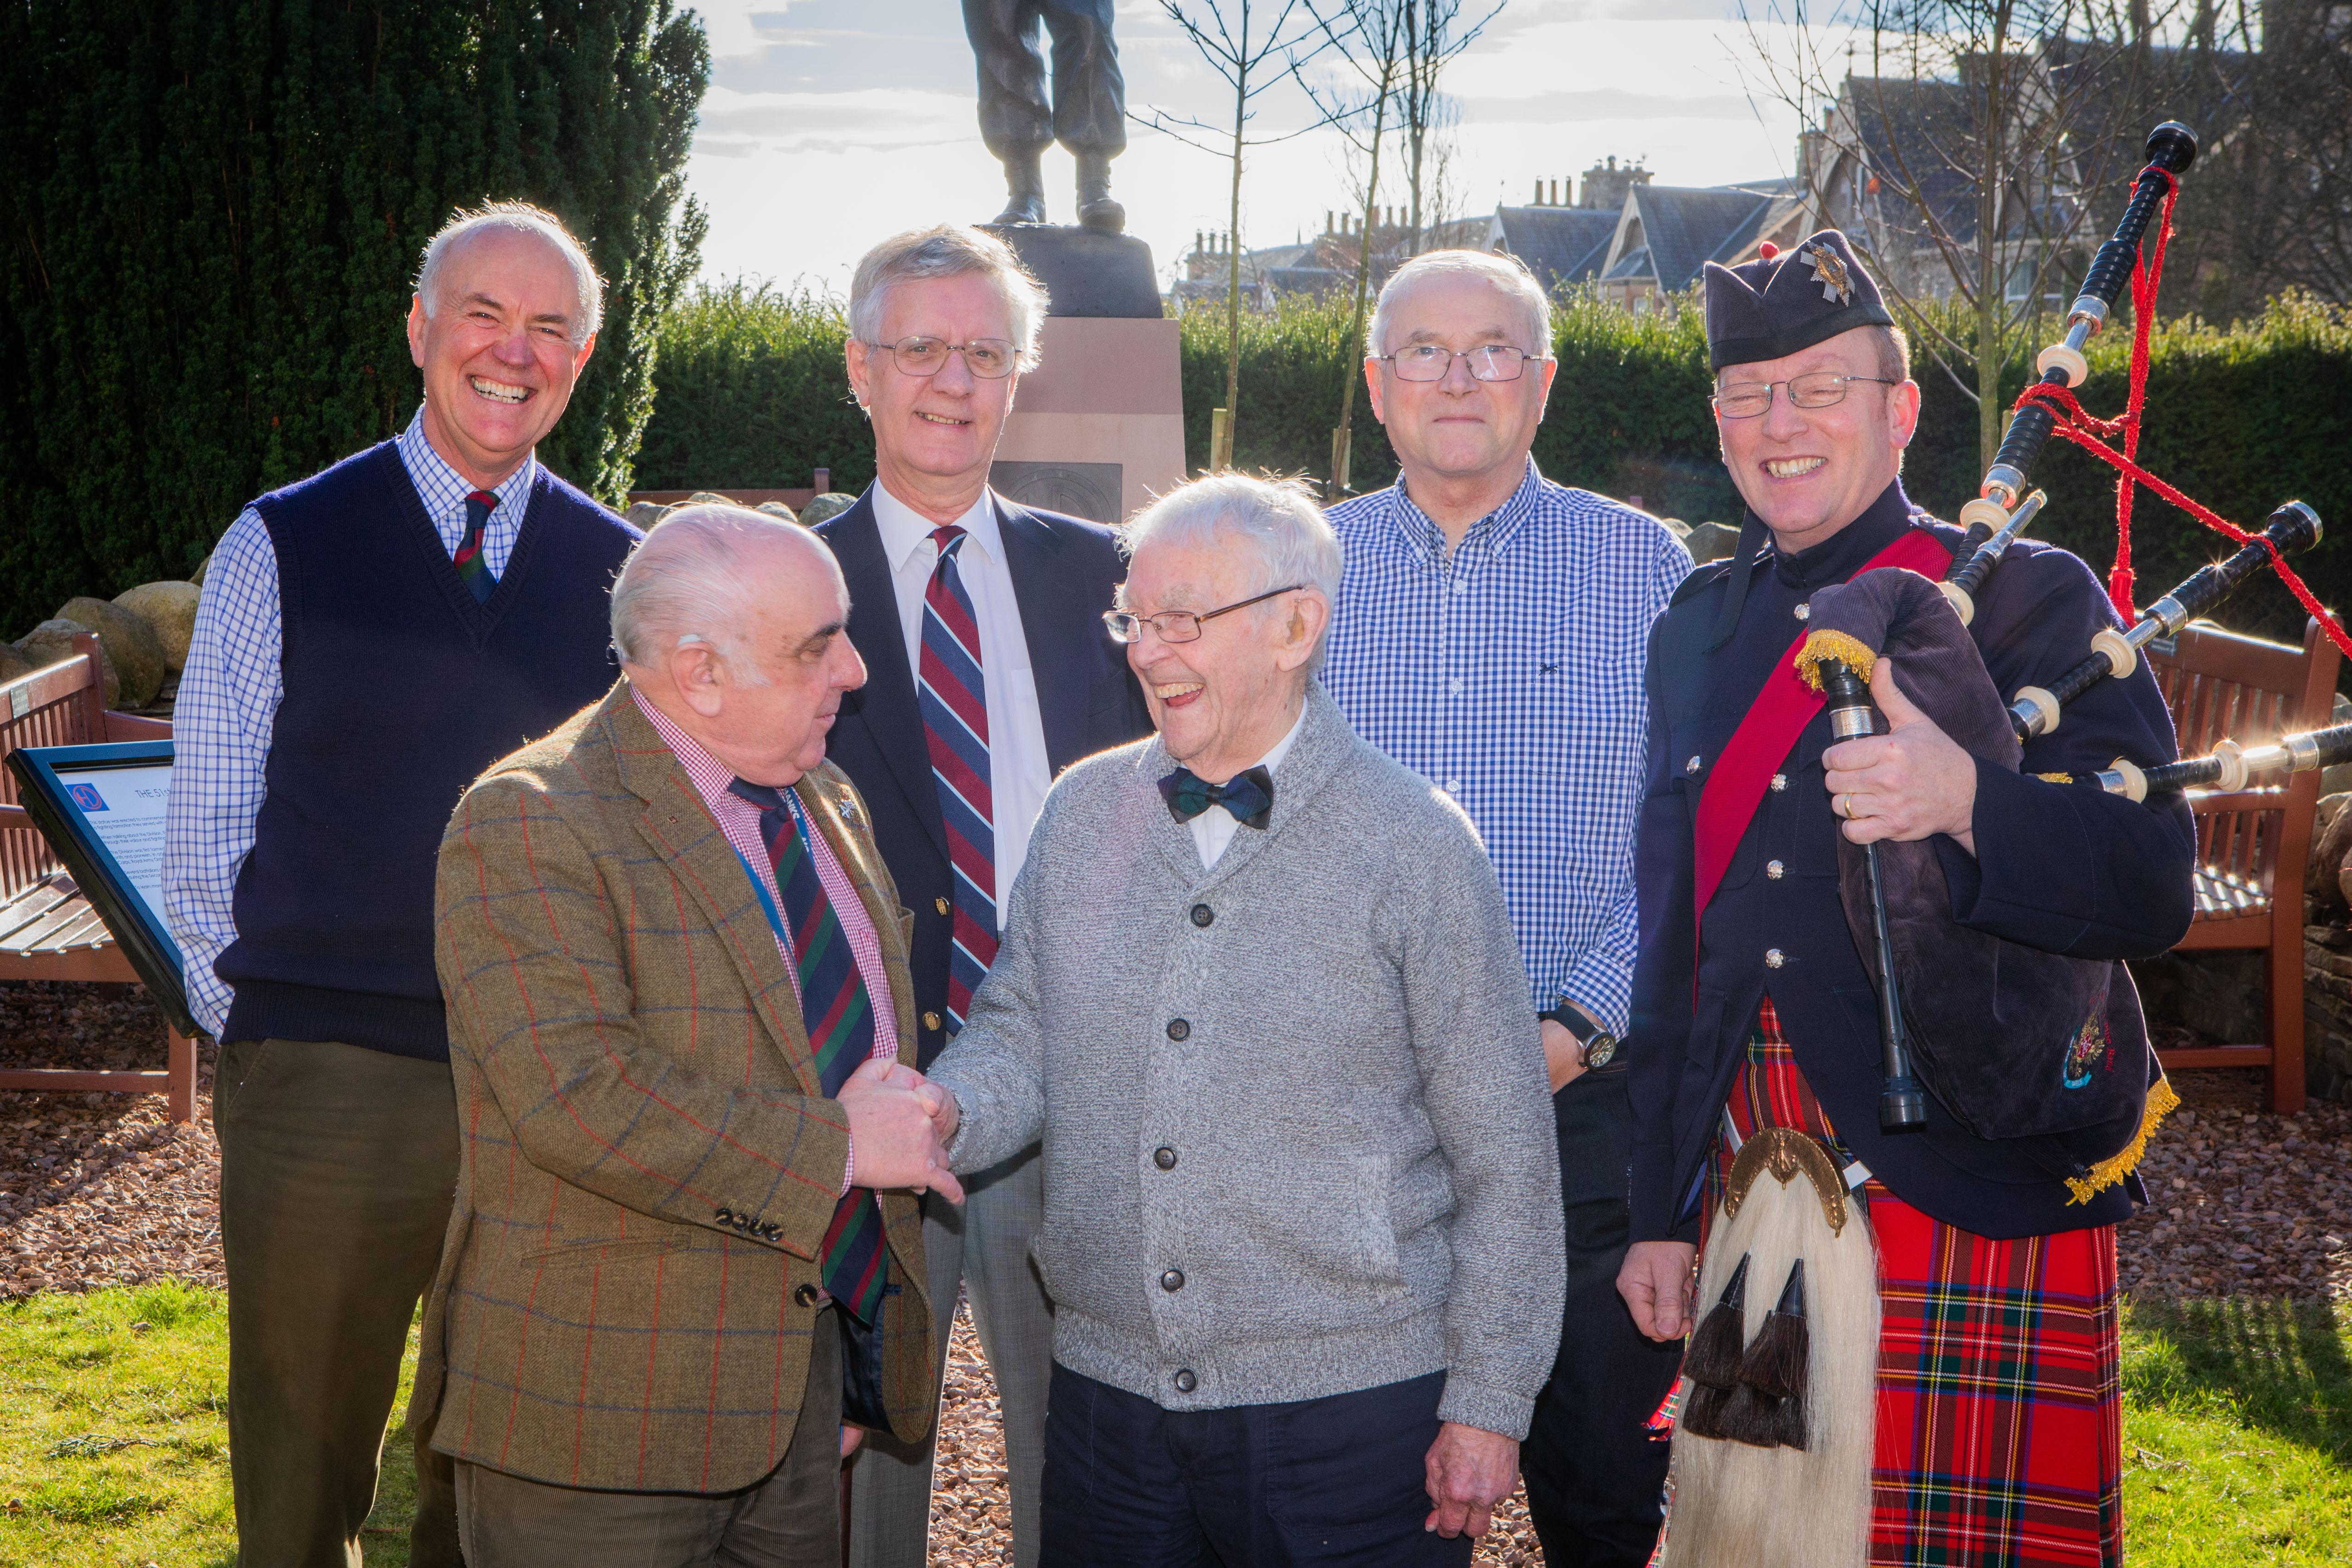 100-year-old Black Watch sergeant remembers daring wartime